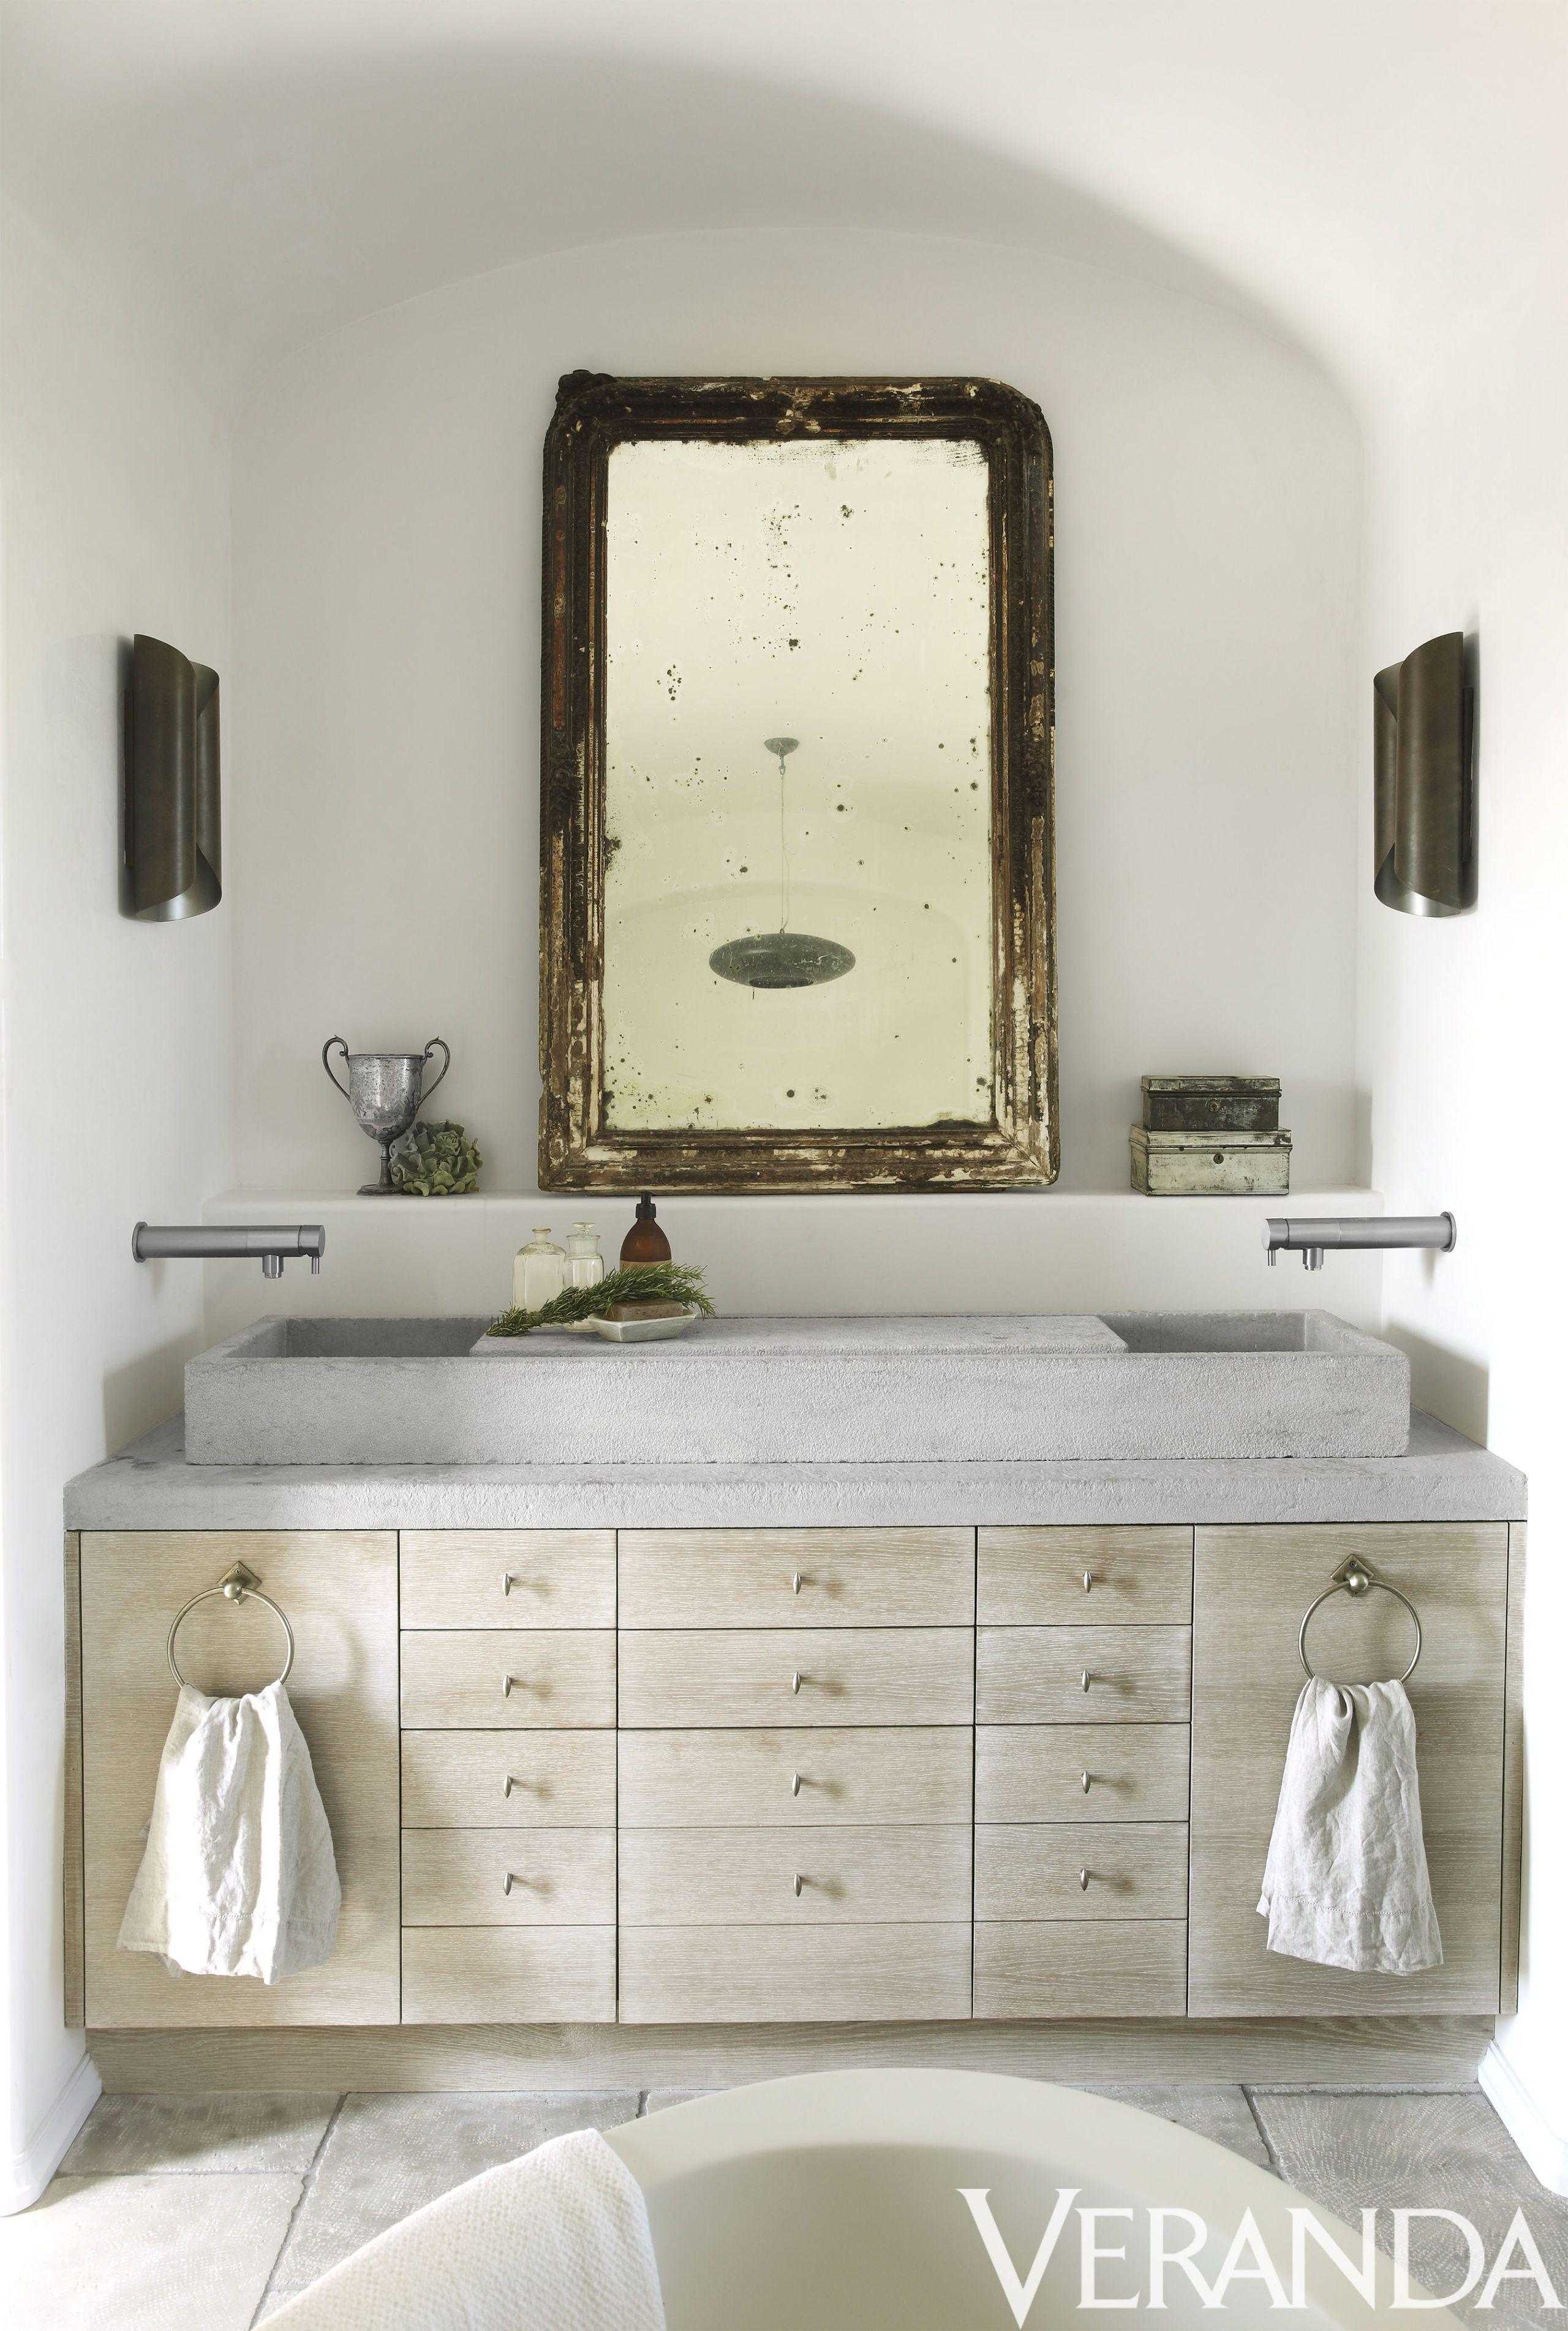 35+ Best Bathroom Design Ideas - Pictures of Beautiful Bathrooms